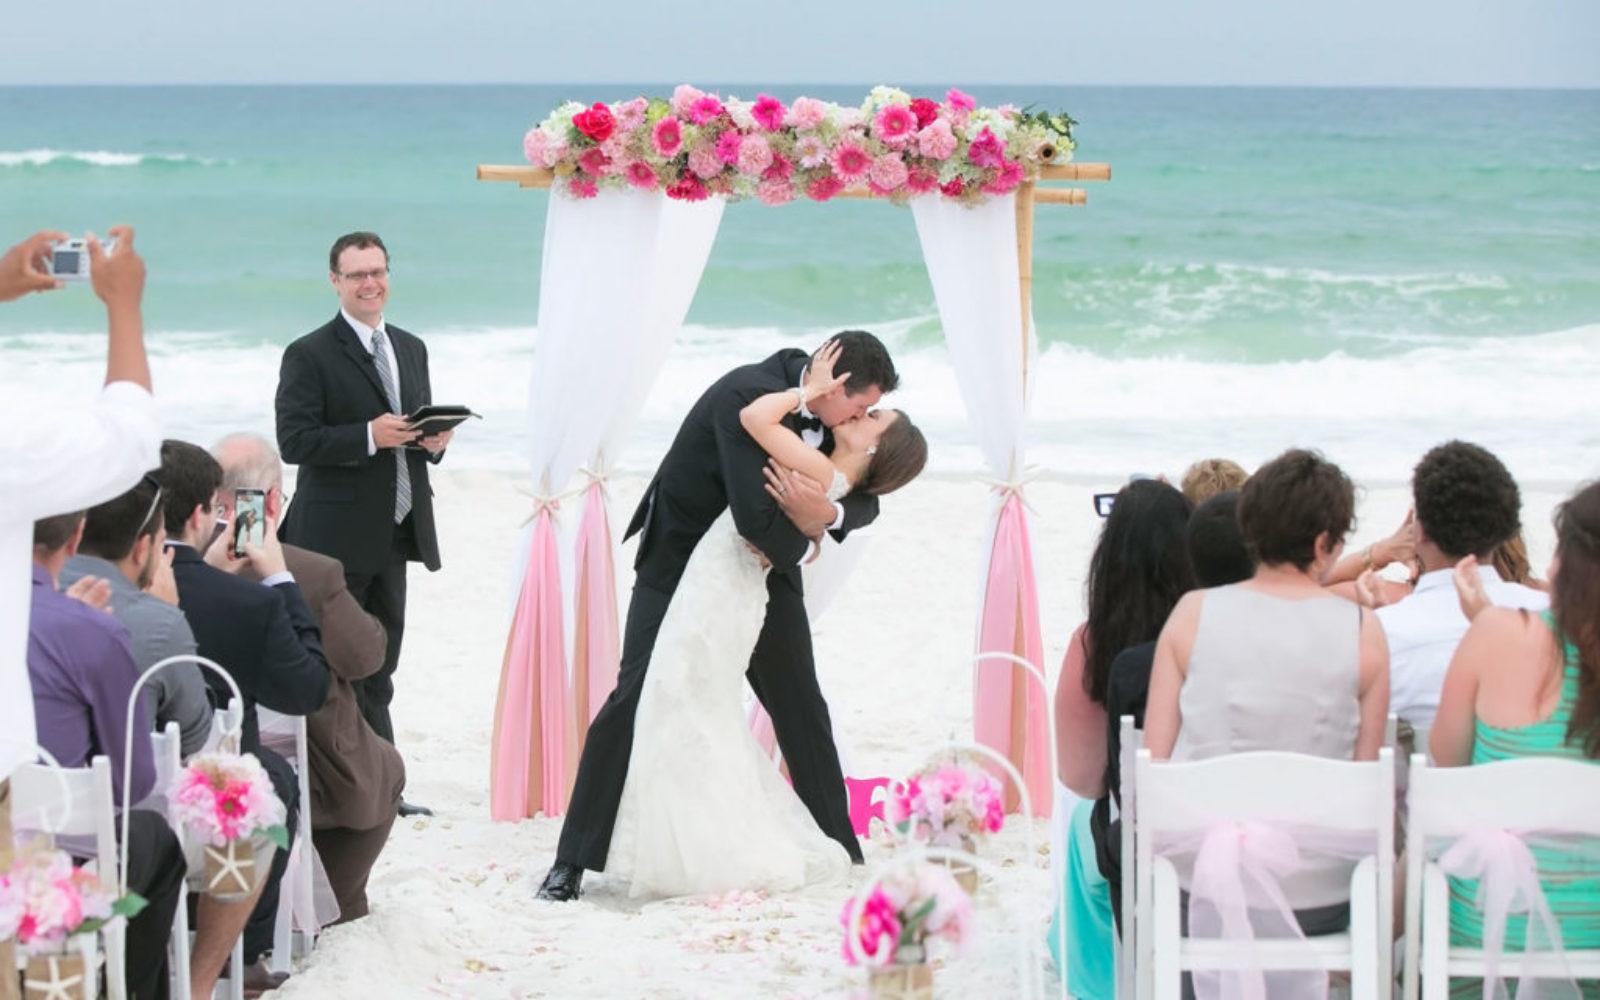 weddingphotographycoloradosprings_42-1024x640